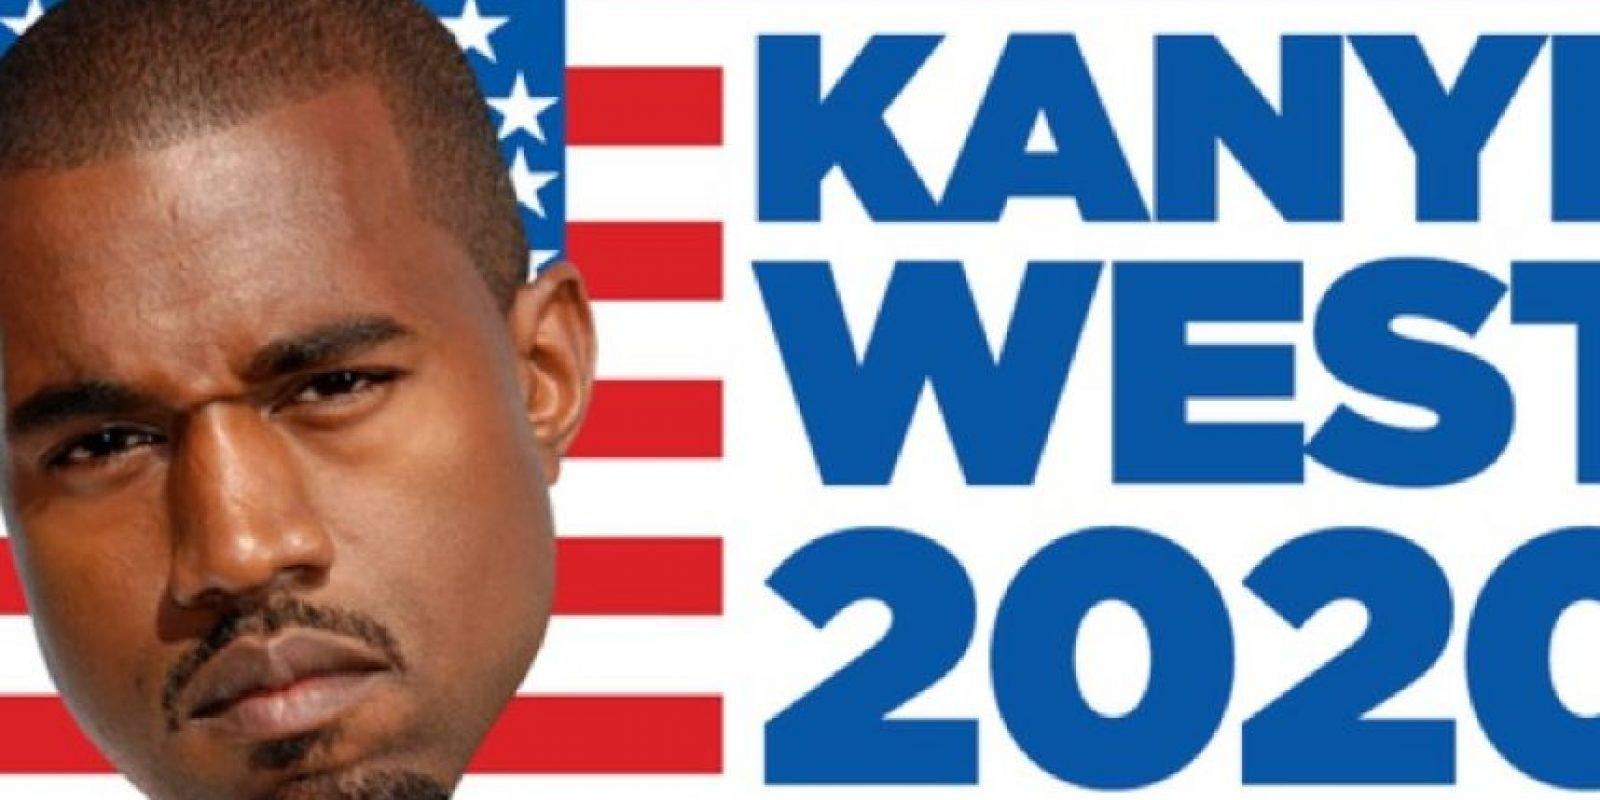 ¿Kanye West para presidente? Foto:Vía Twitter